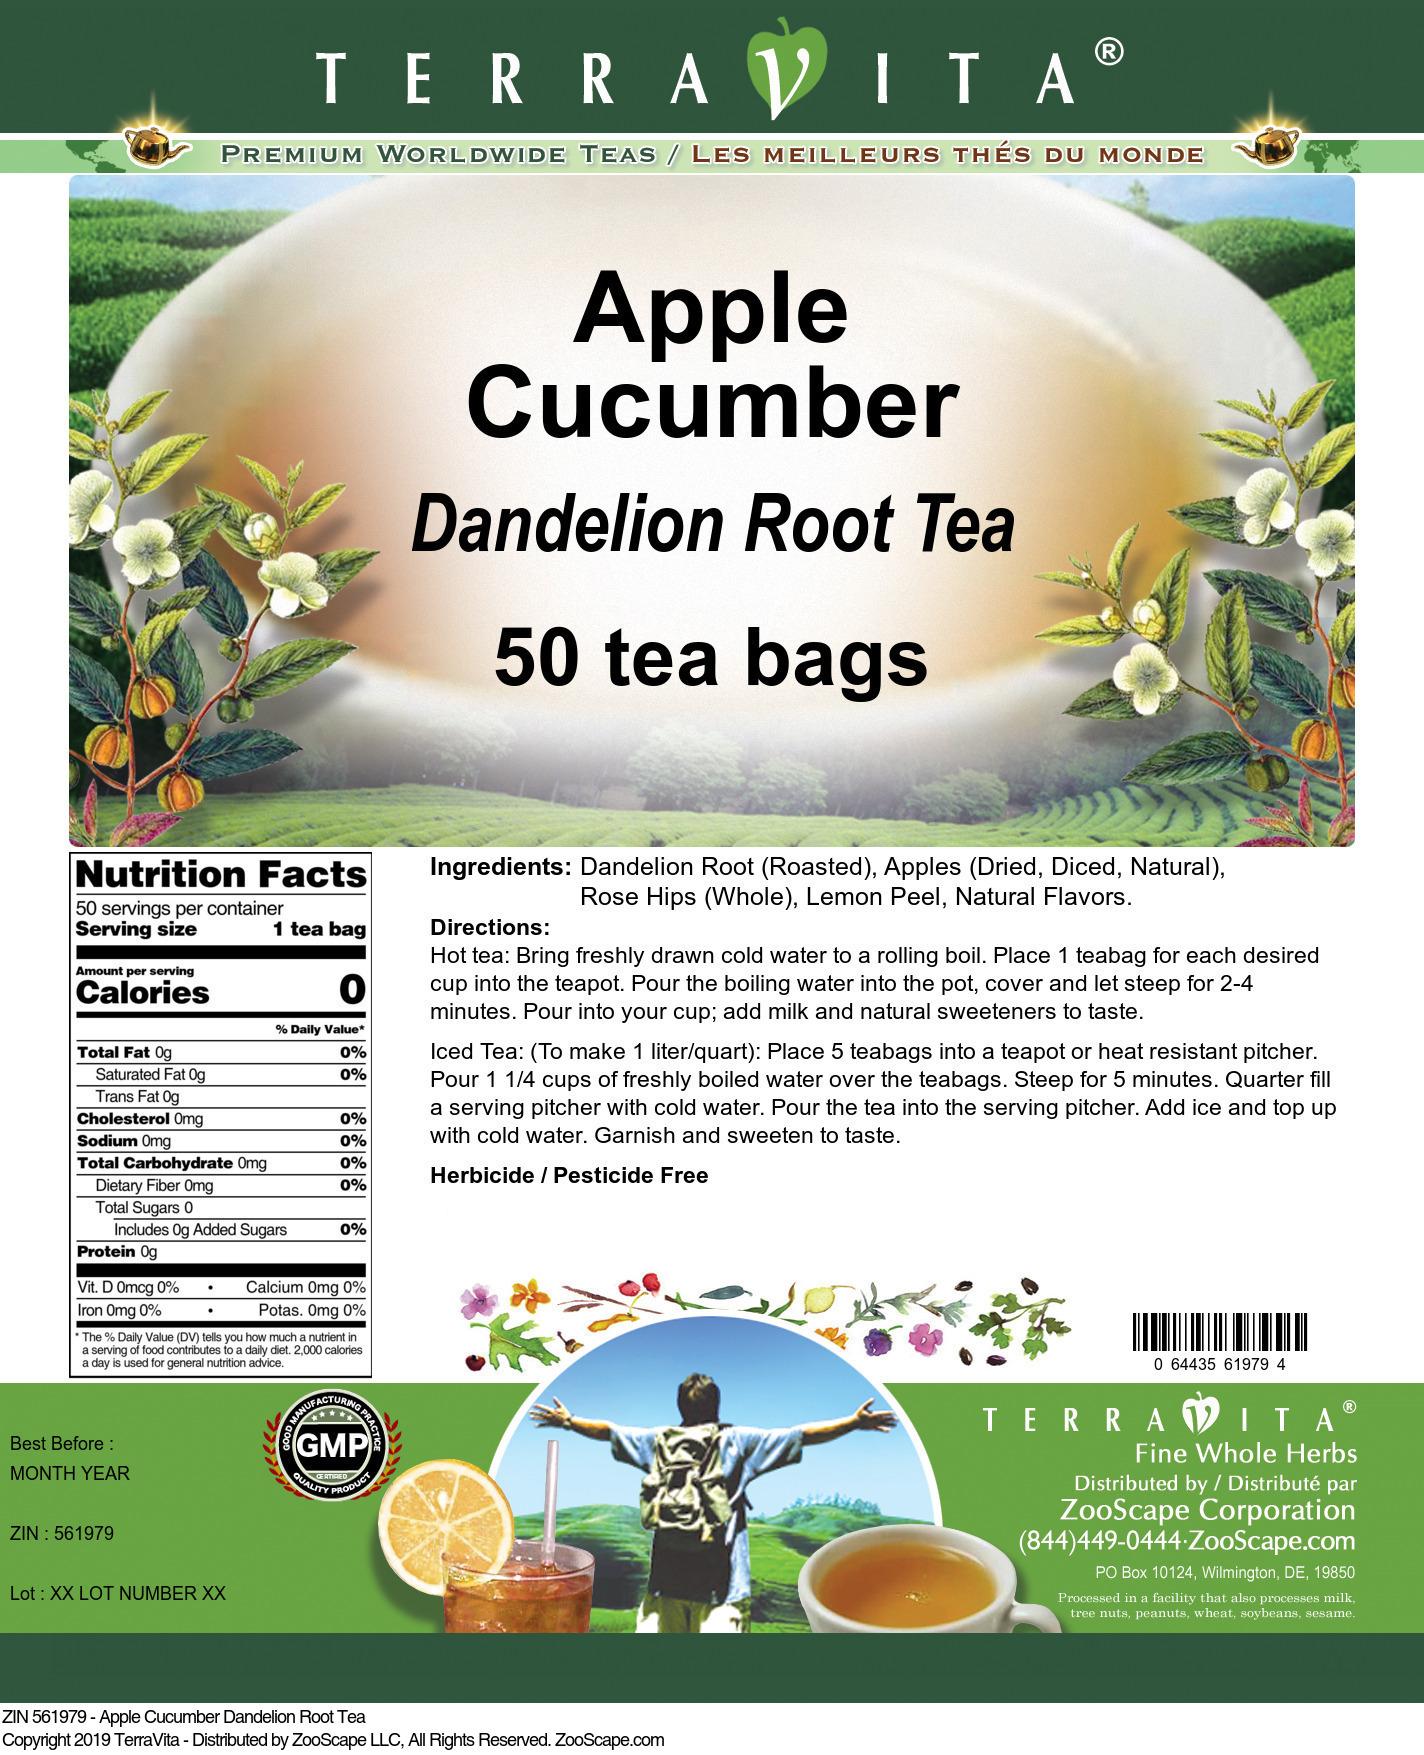 Apple Cucumber Dandelion Root